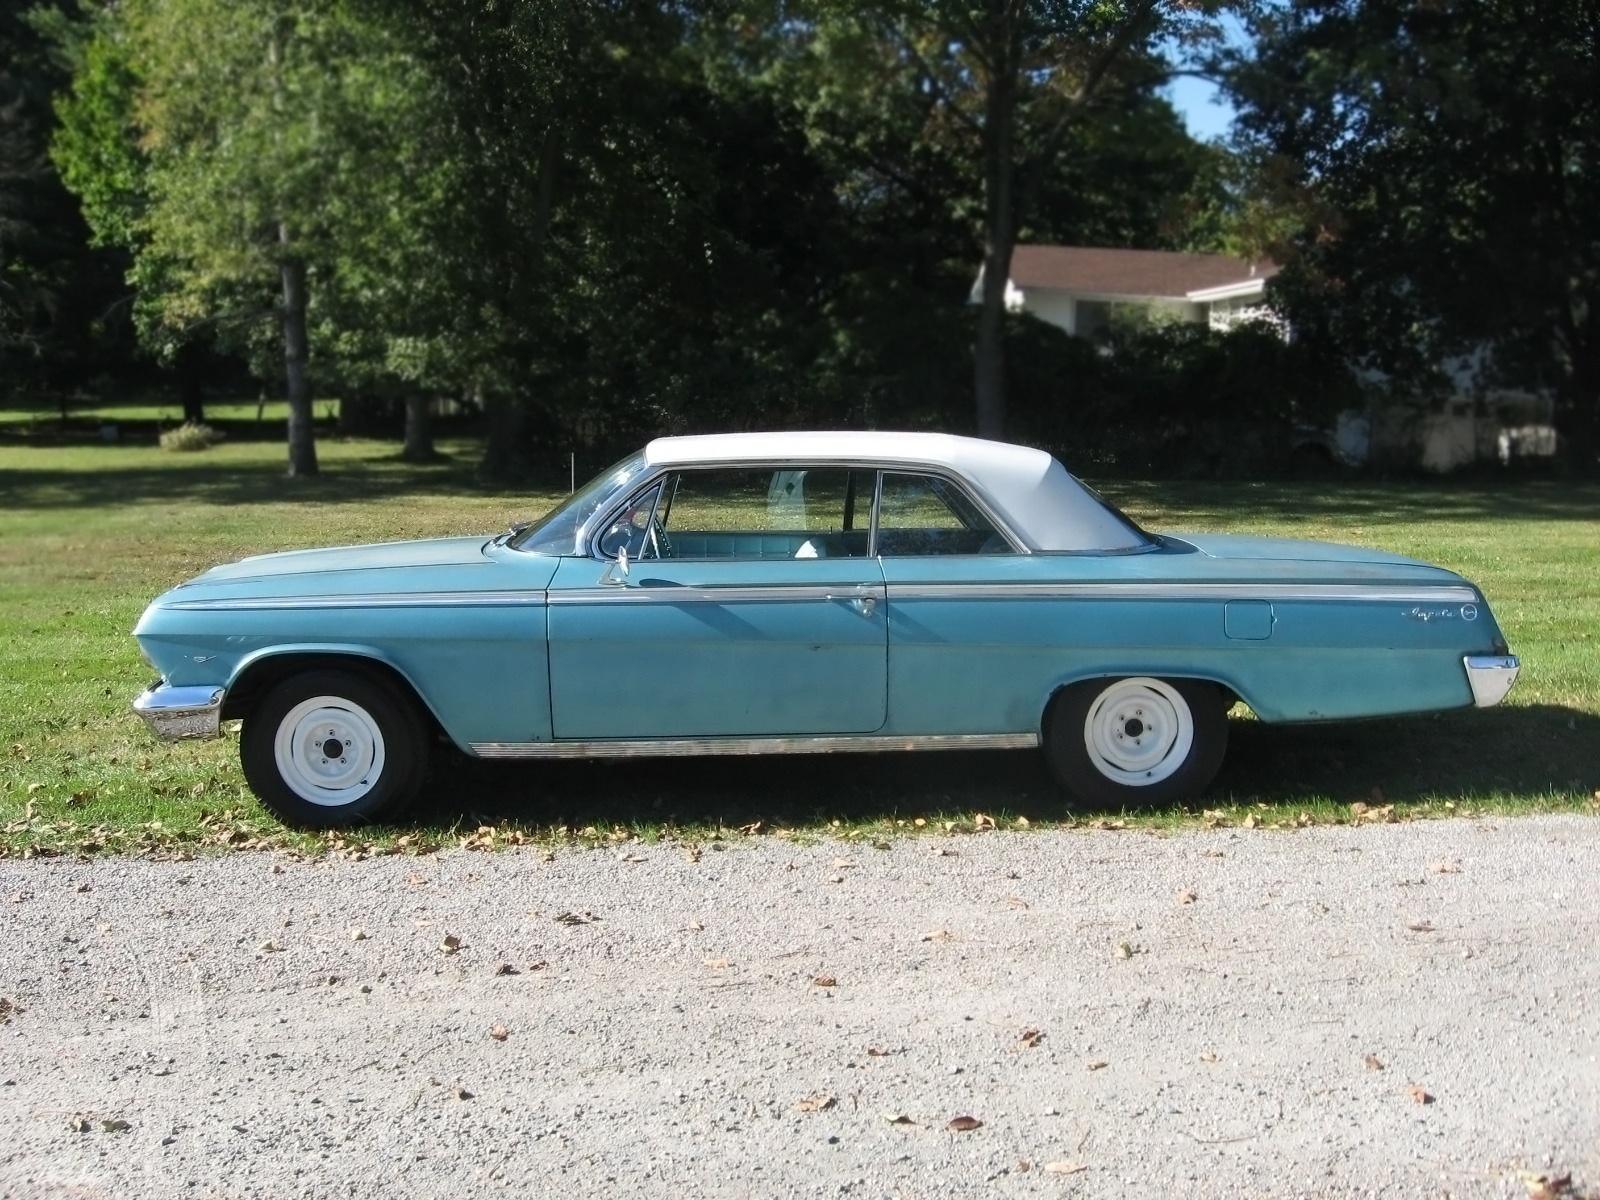 Almost Done 1962 Chevrolet Impala